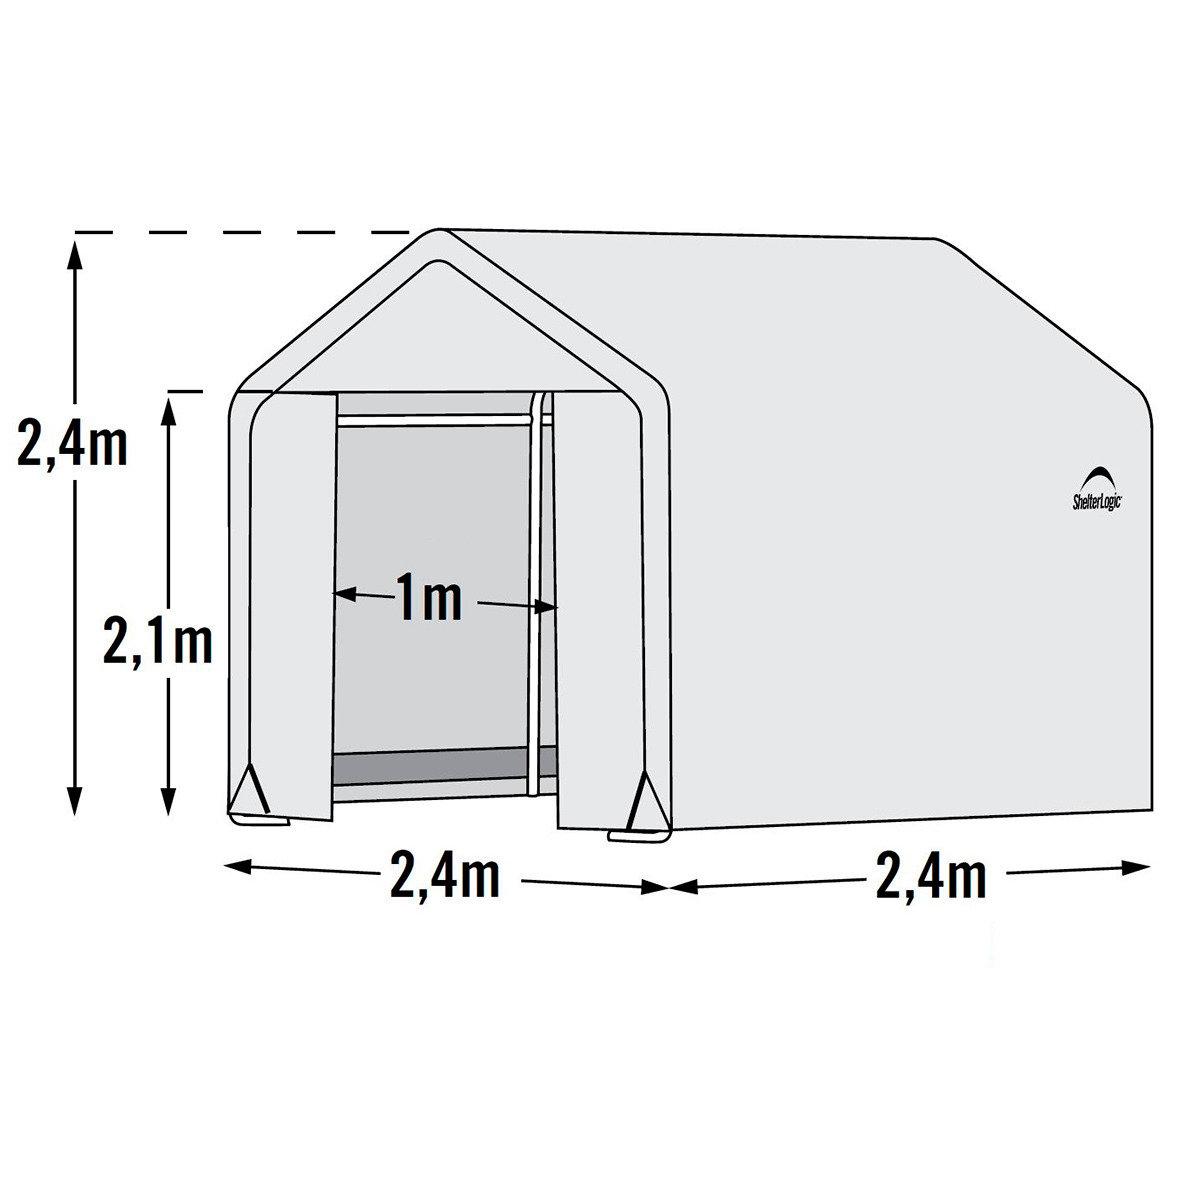 ShelterLogic Folien-Gewächshaus 5,76m² inkl. Sturmanker | #7